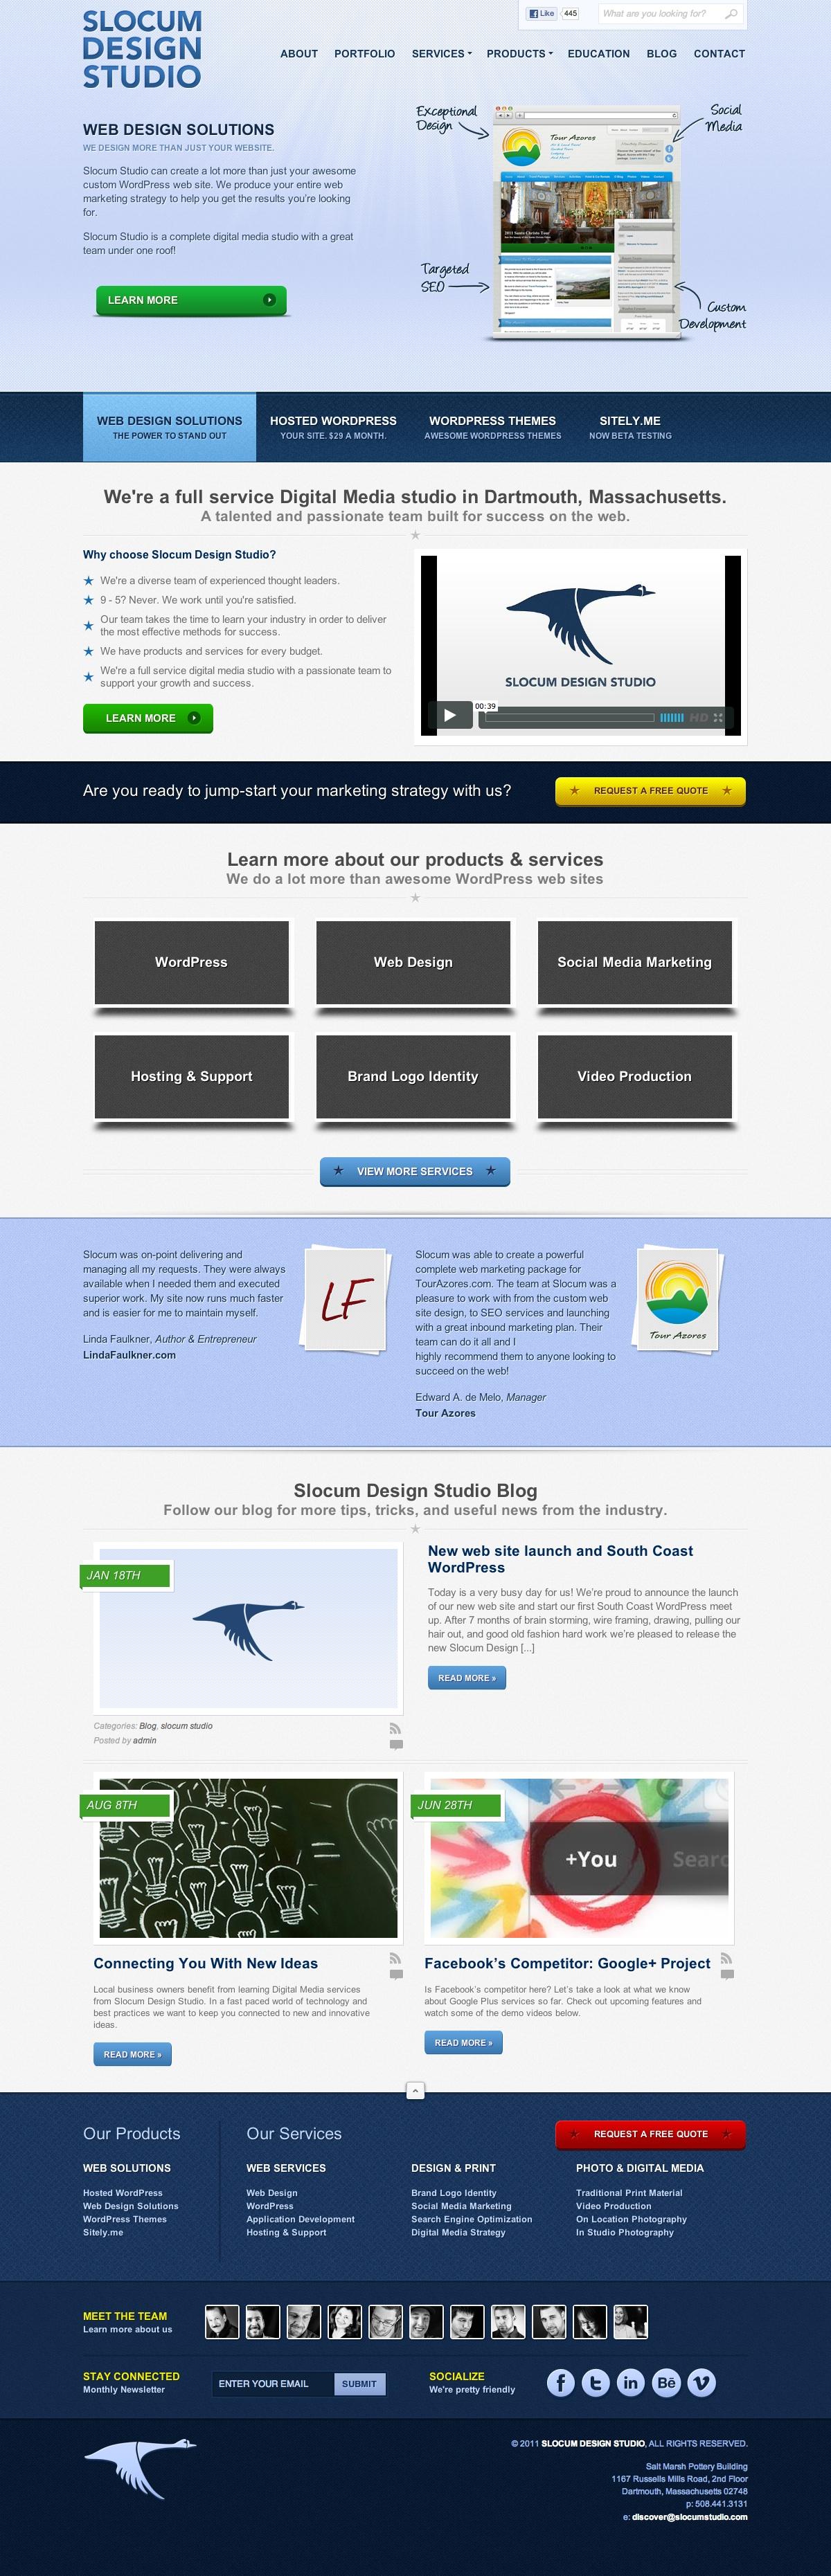 Slocum Design Web Design - Home by maverick3x6